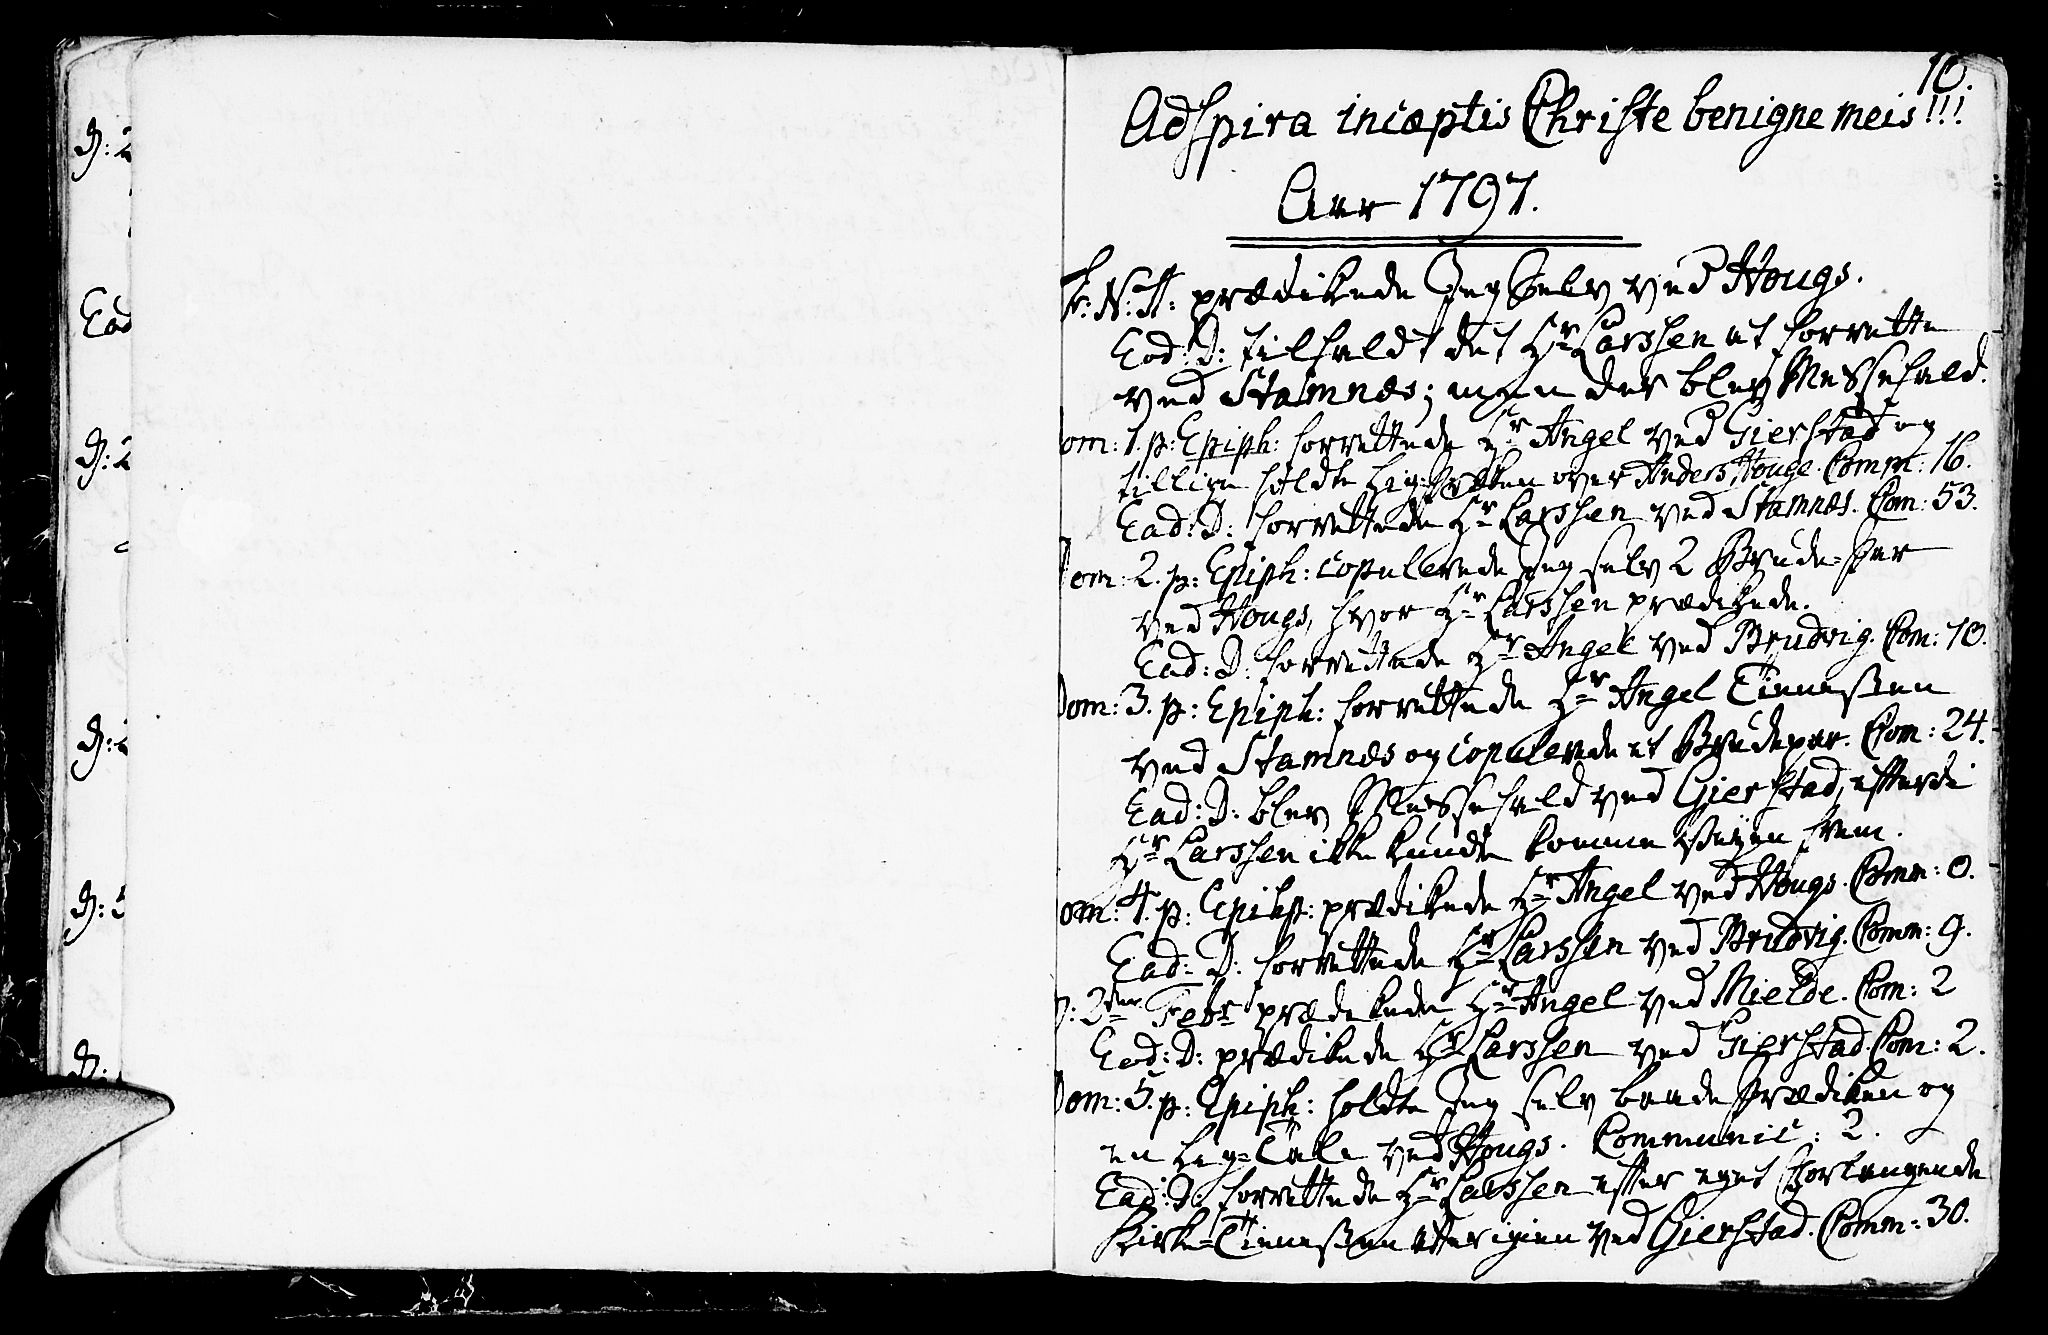 SAB, Haus sokneprestembete, H/Haa: Ministerialbok nr. A 11, 1796-1816, s. 10